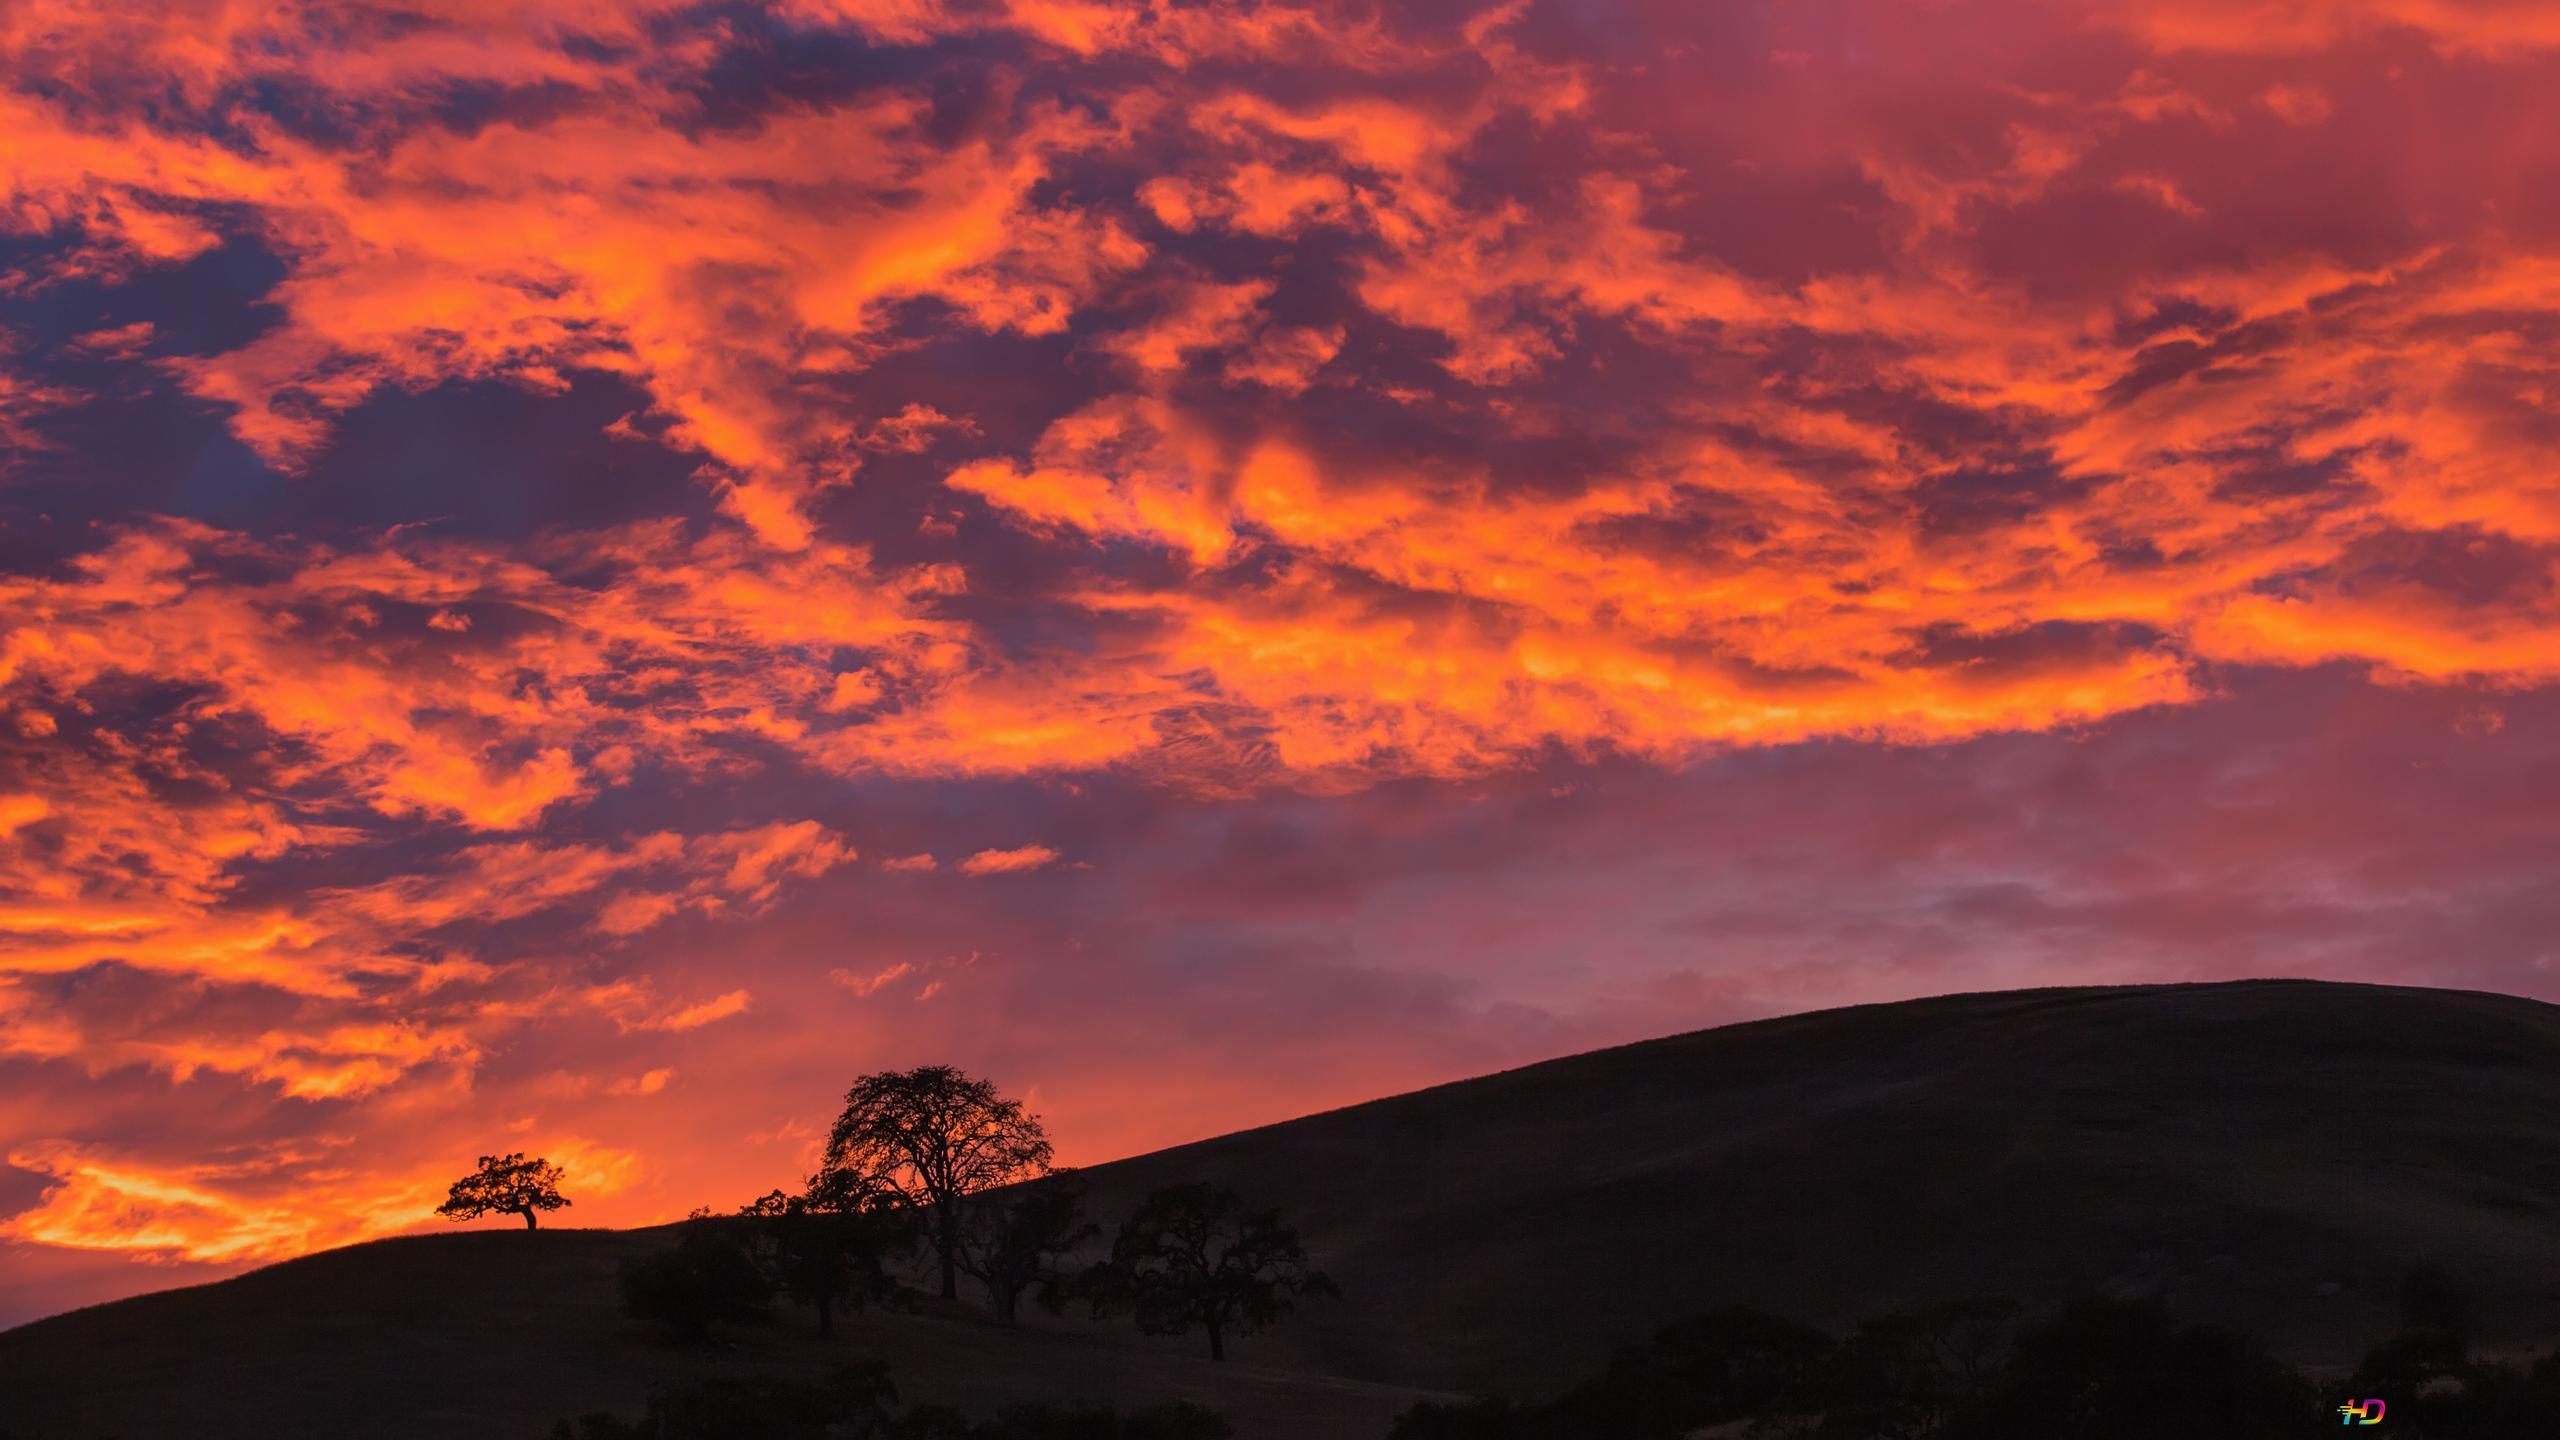 Red Cloud Sky Hd Wallpaper Download